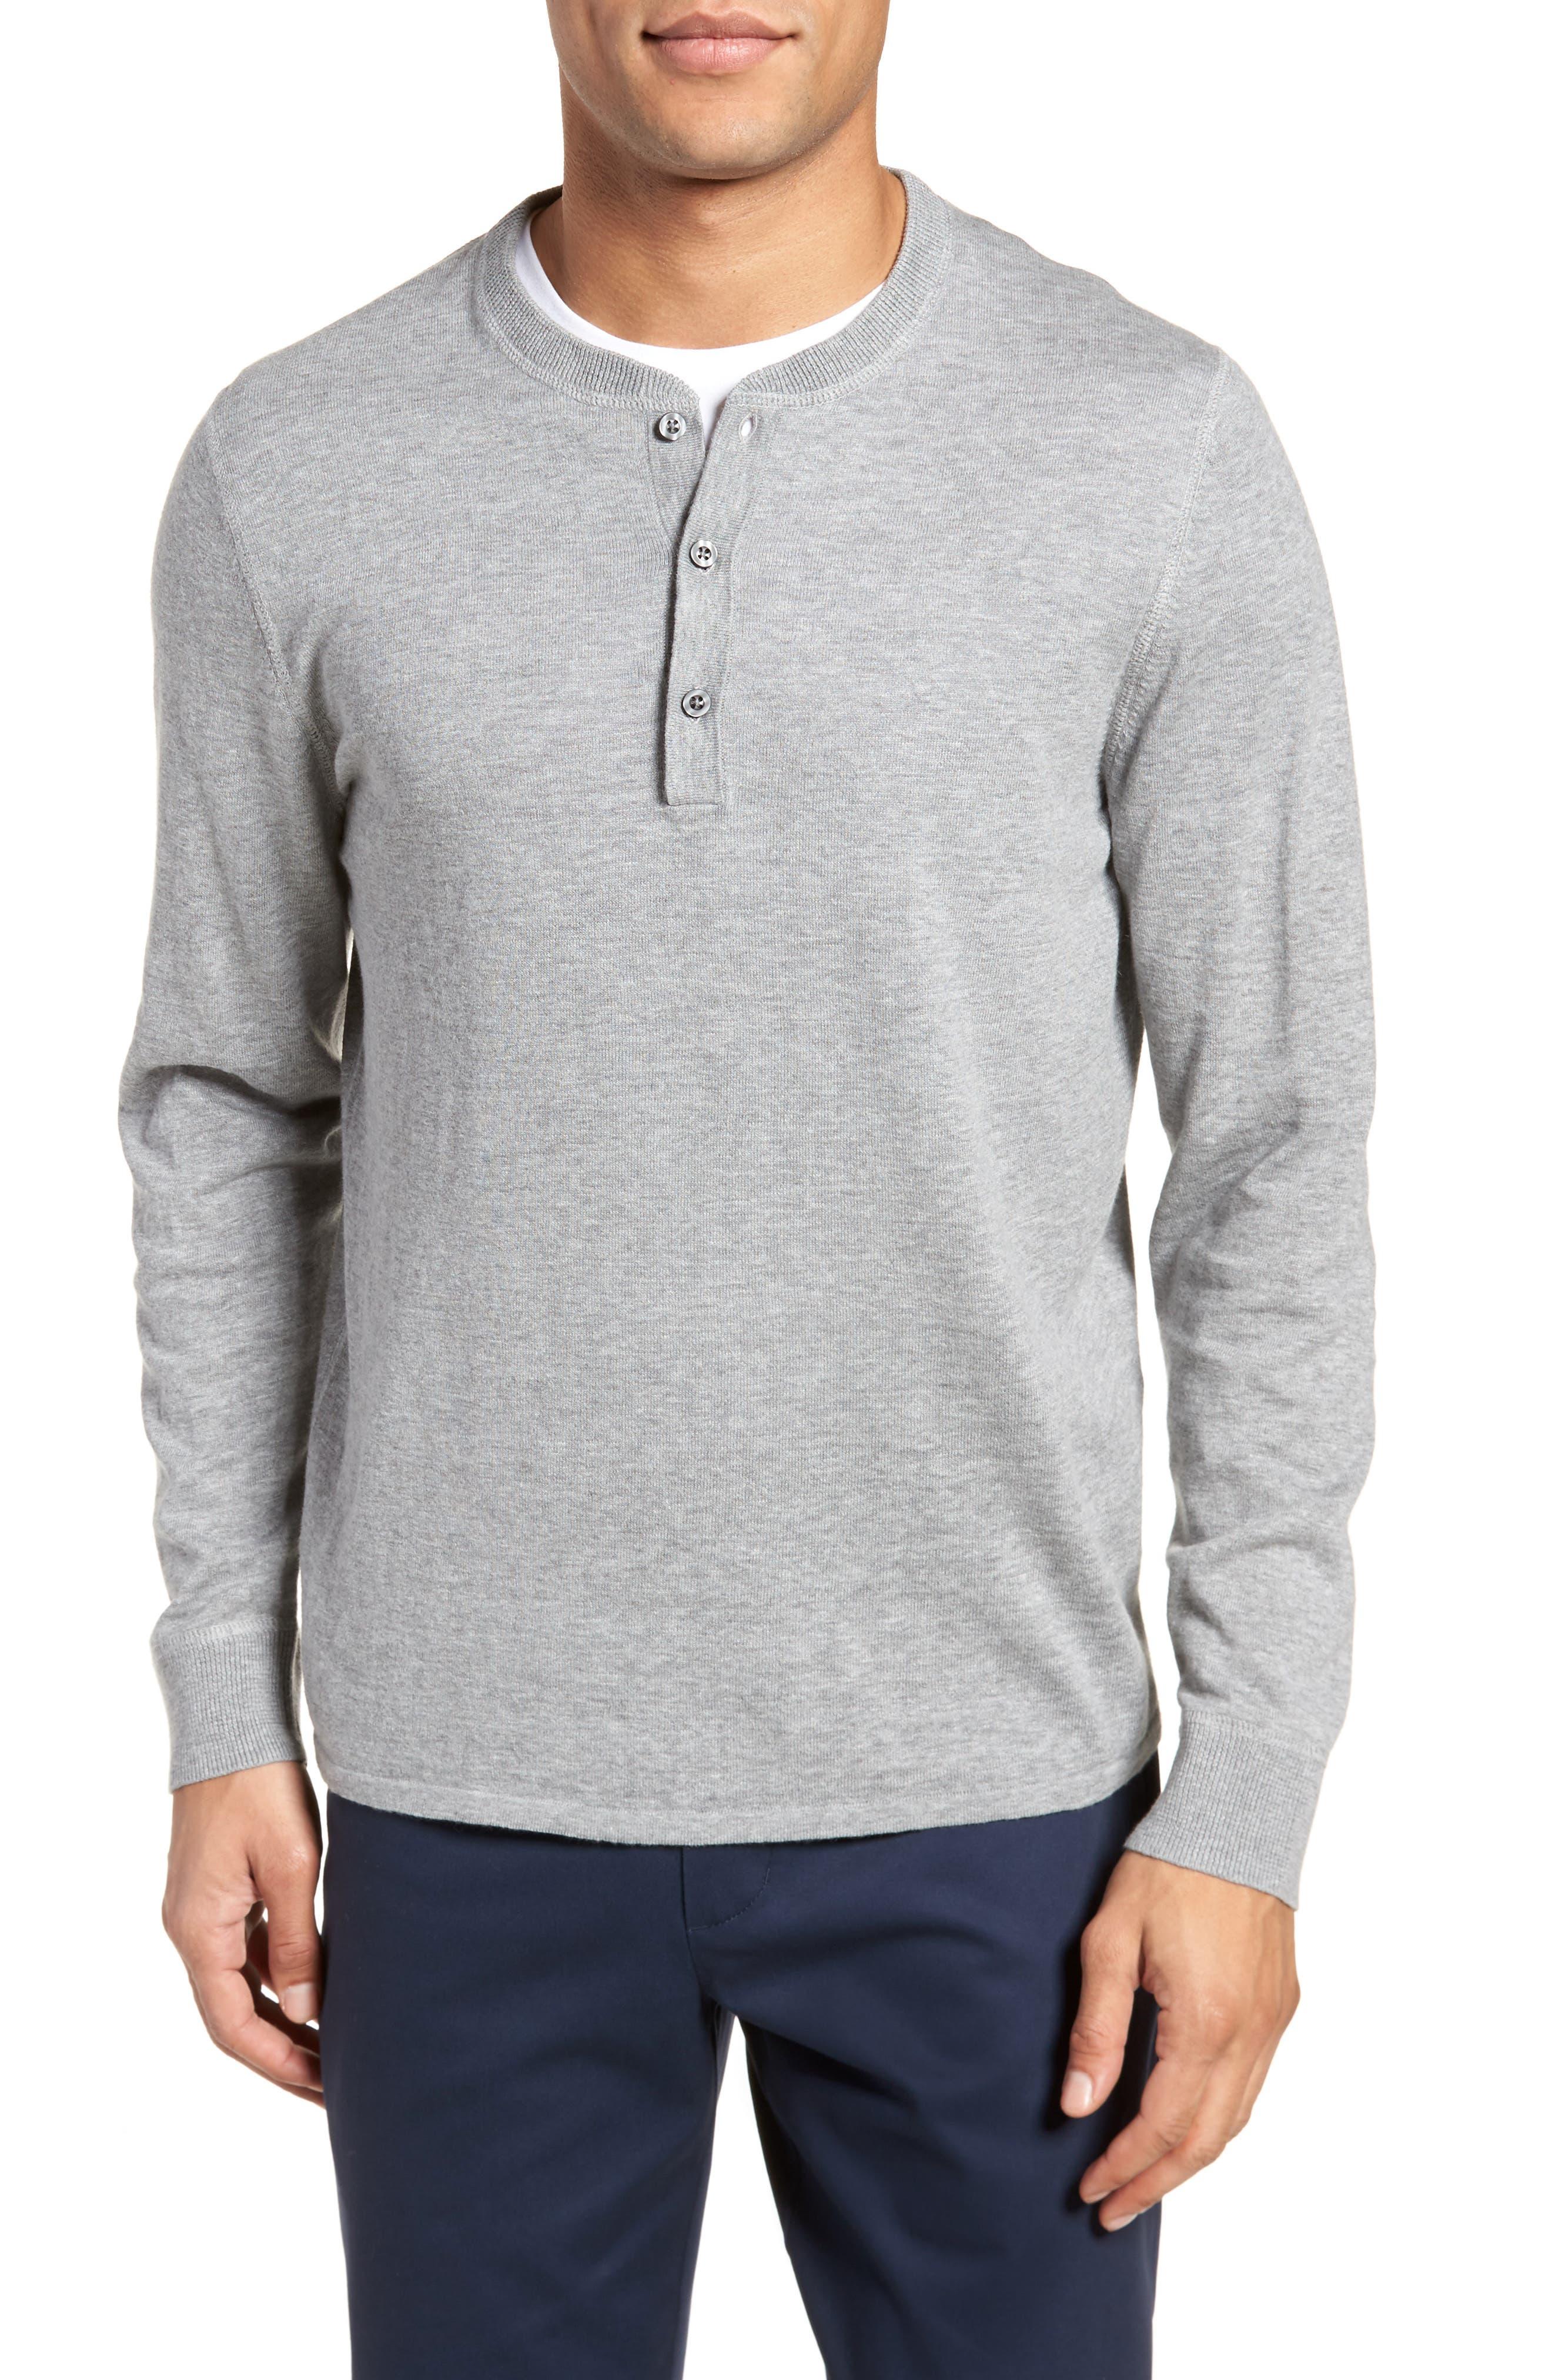 Nordstrom Men's Shop Long Sleeve Cotton & Linen Blend Henley